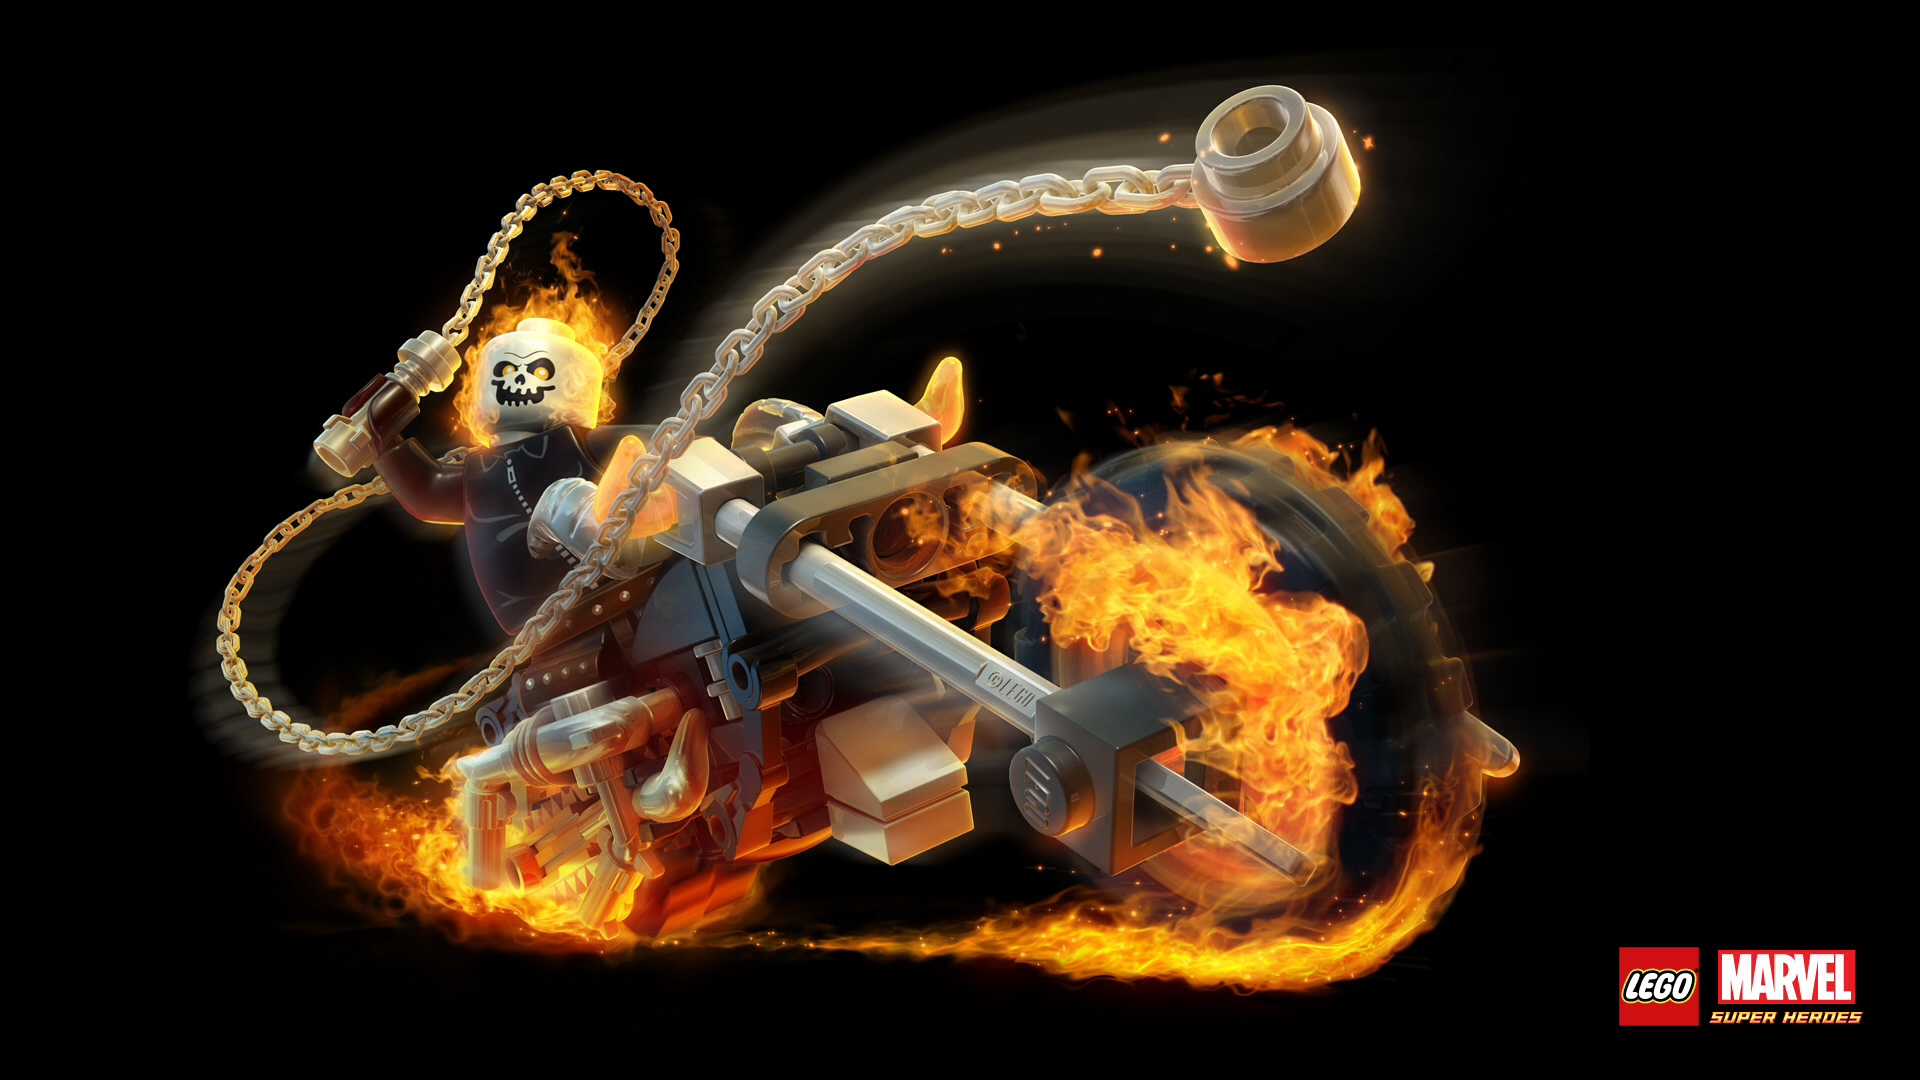 Ghost Rider S Motorcycle Lego Marvel Superheroes Wiki Fandom